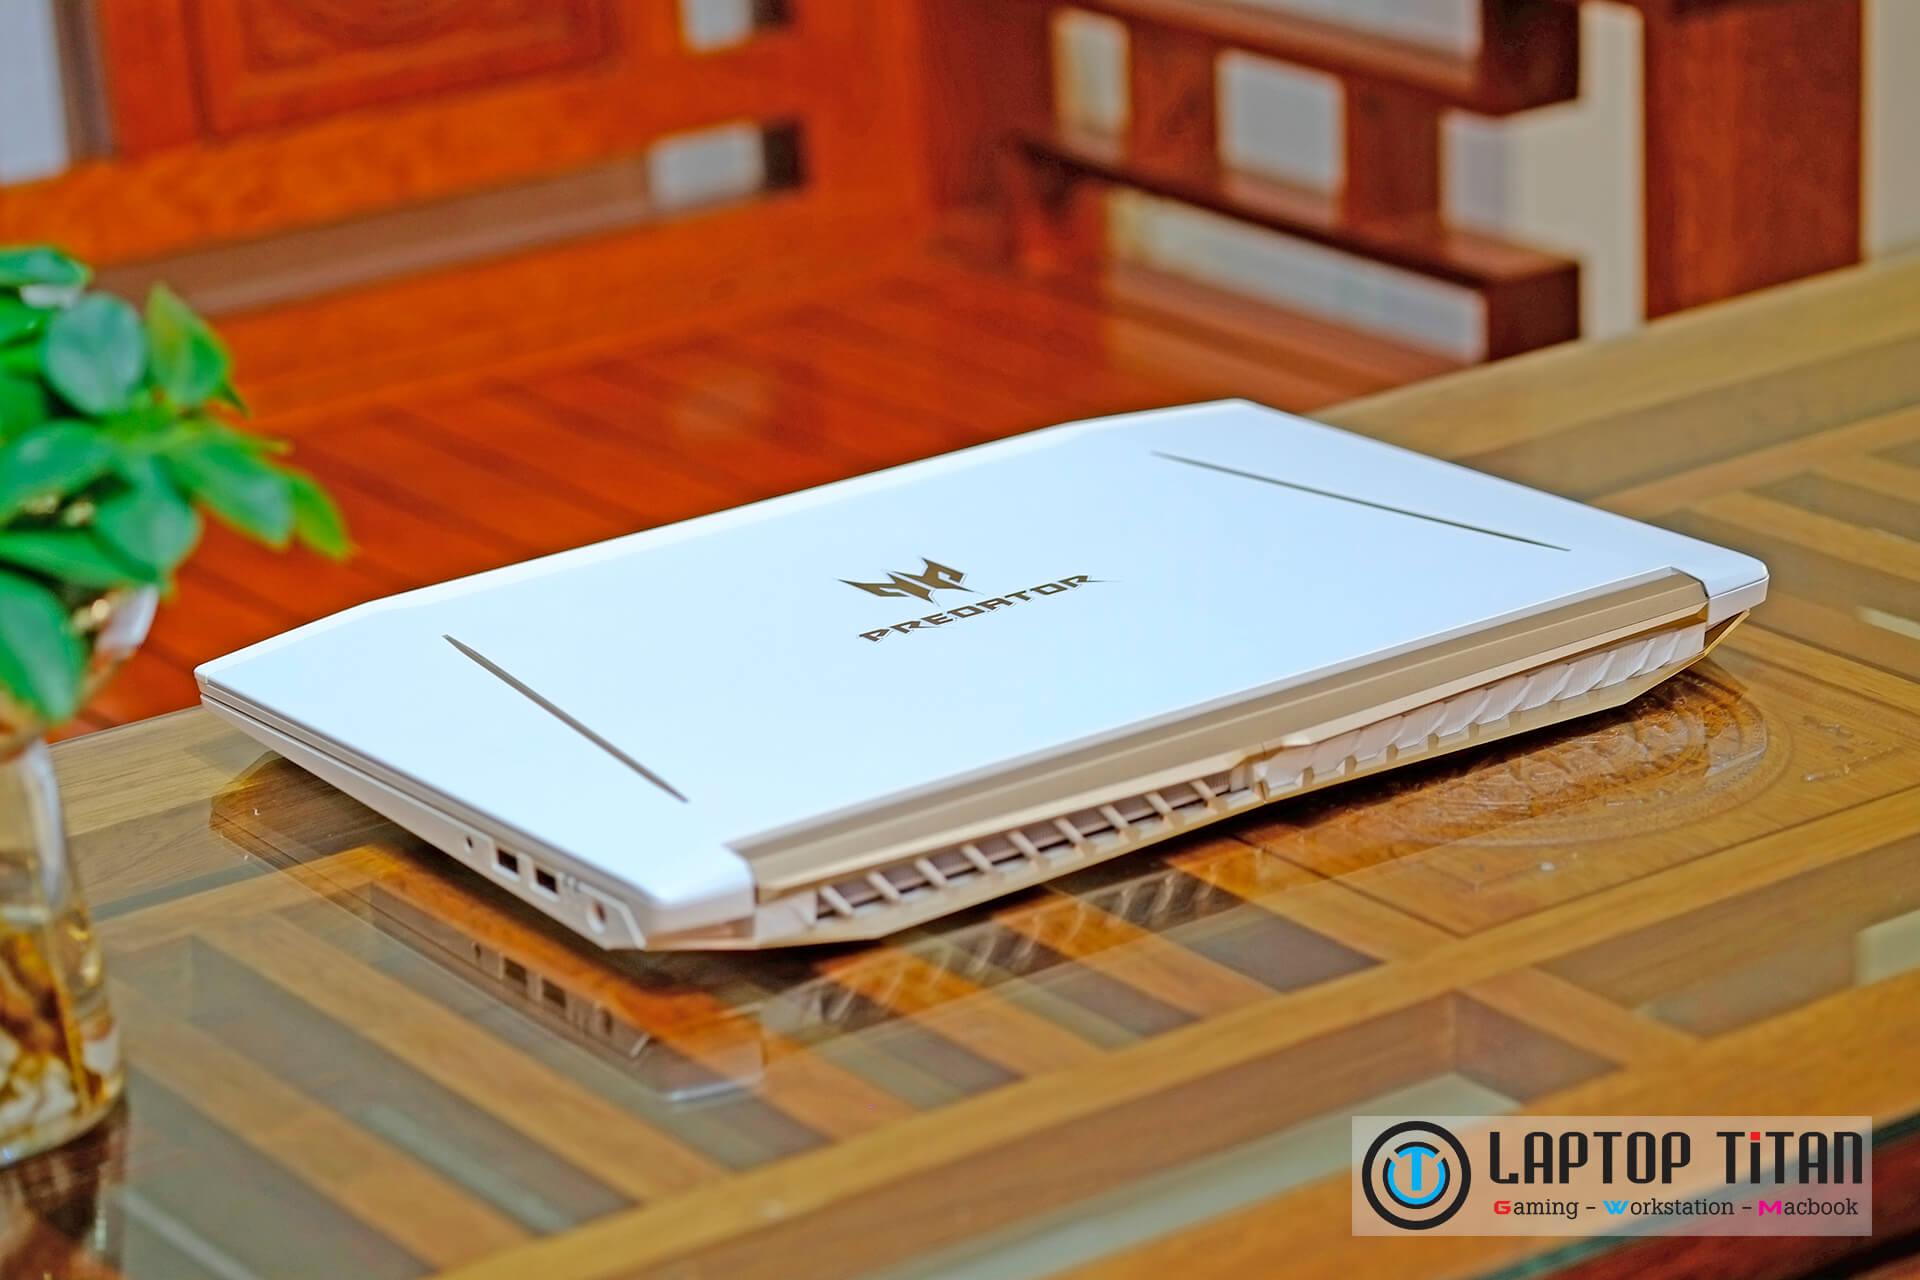 Acer Predator Helios 300 Special Edition Core i7 8750H / GTX 1060 6GB / 15.6-inch FHD 144Hz